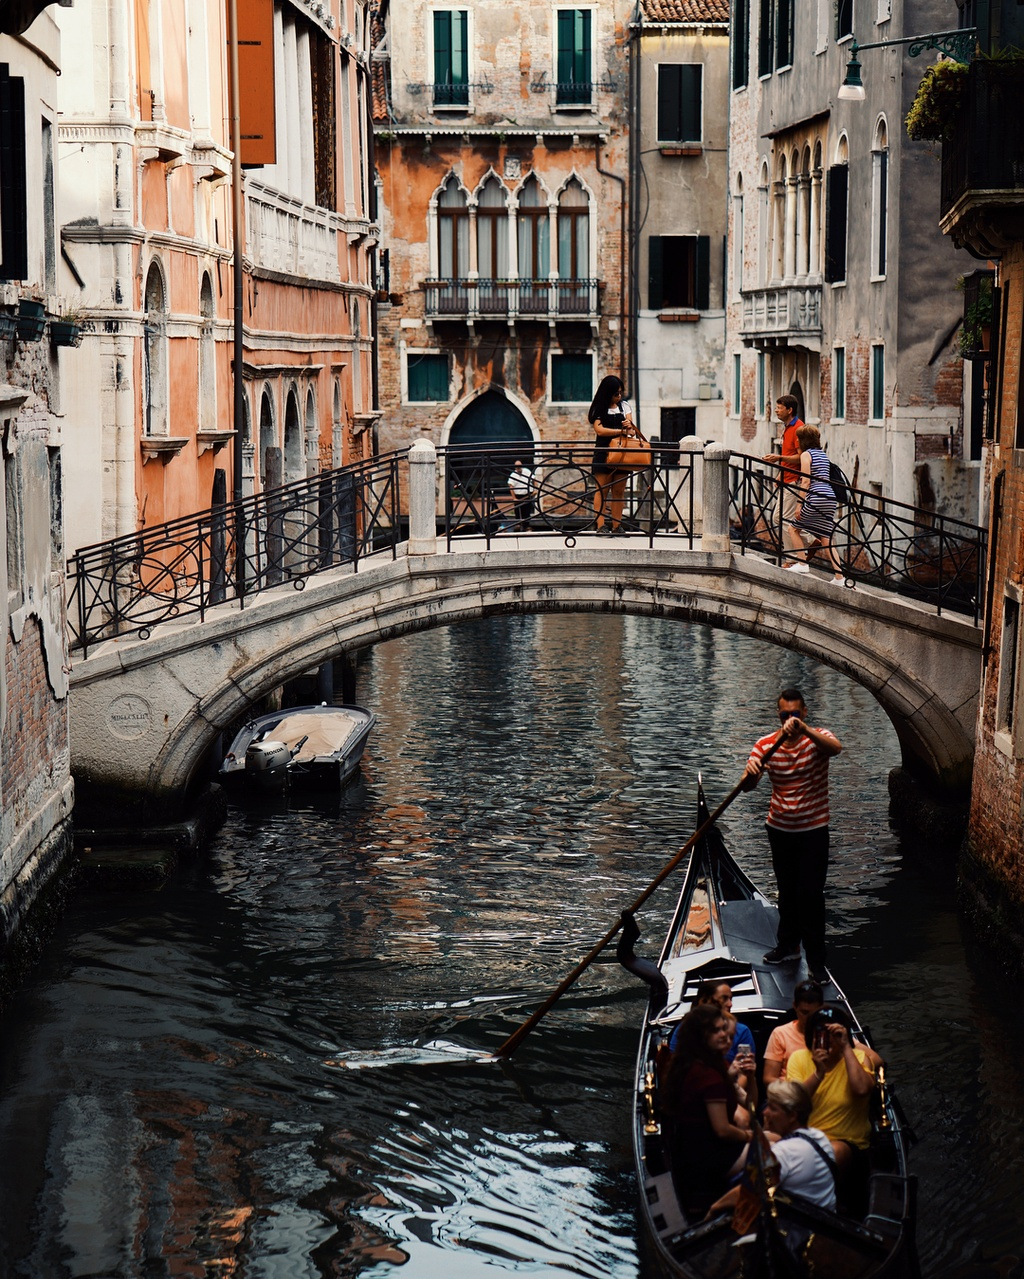 Theo chan Chau Bui den Venice: Lac vao giac mong dep quen loi ve hinh anh 4